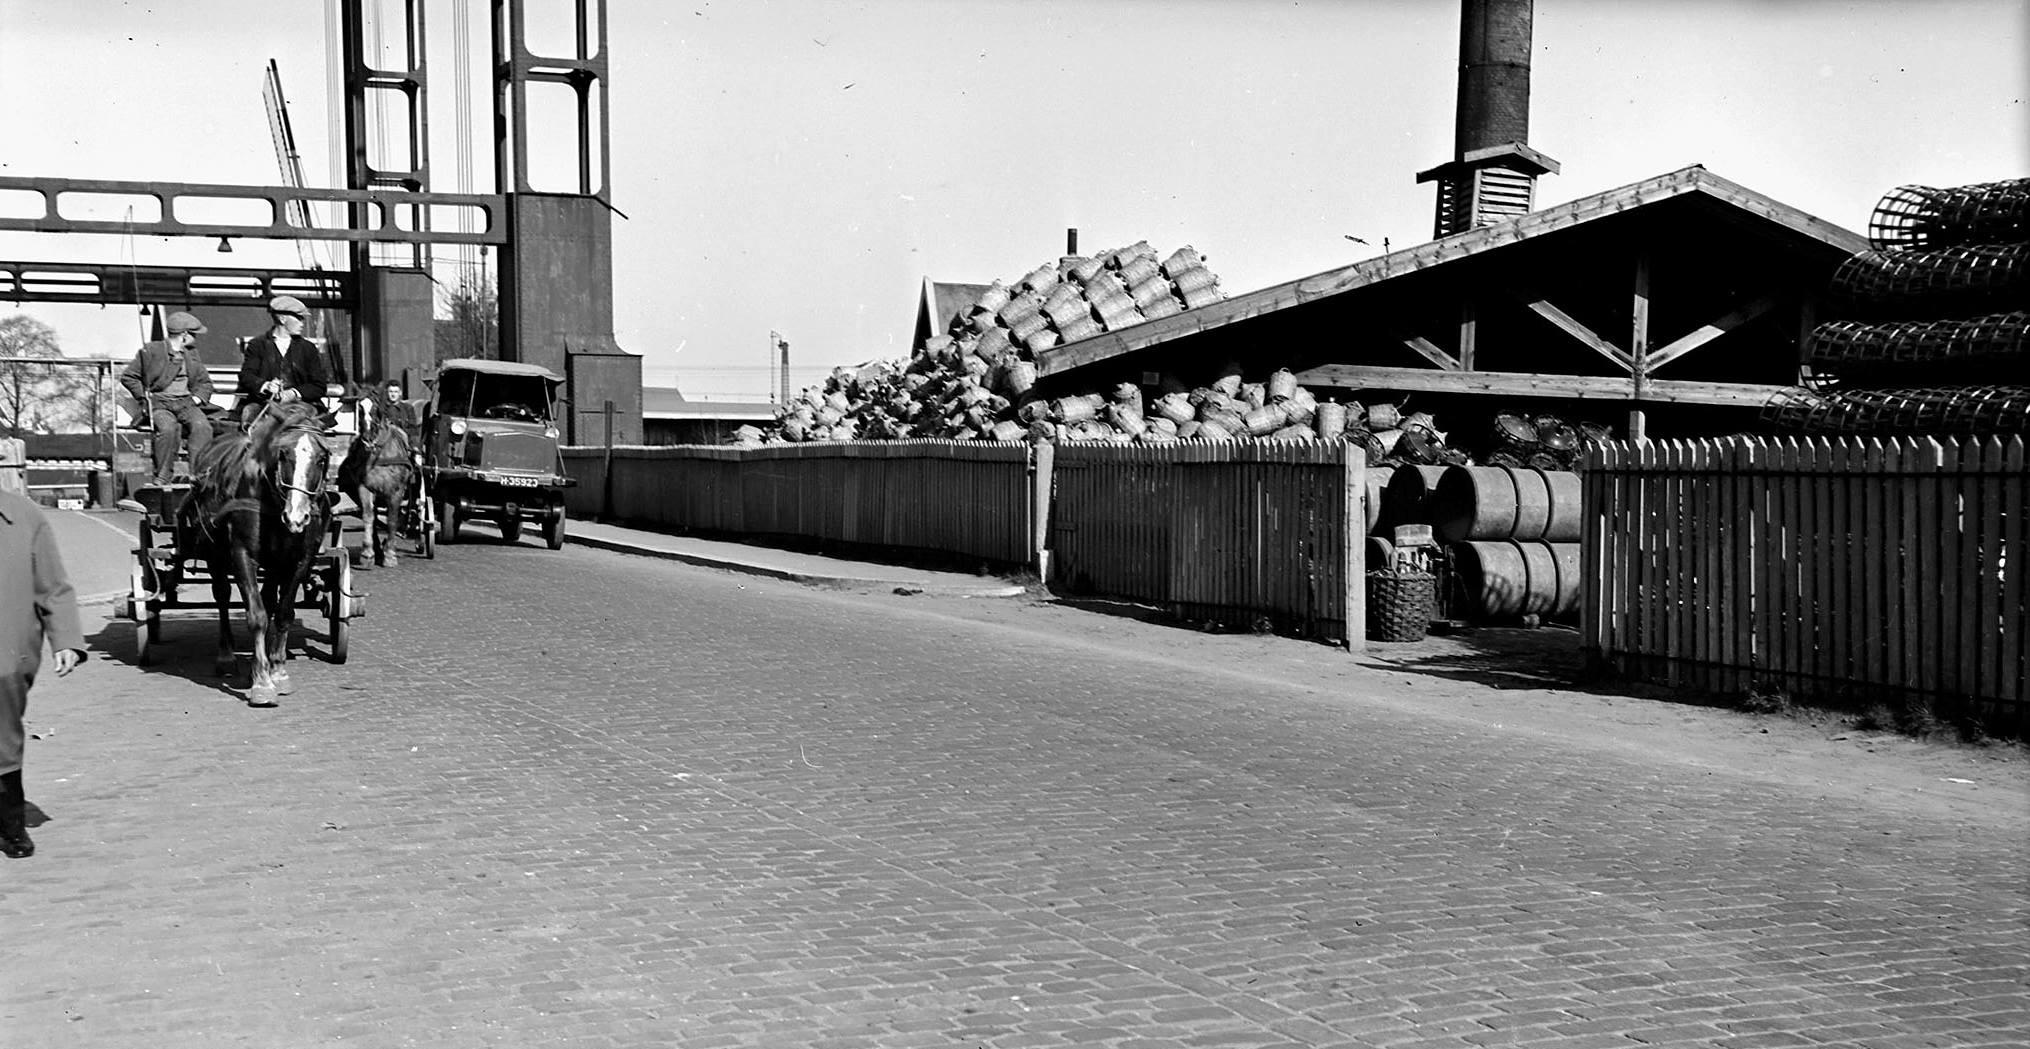 1938-Dordrecht--s-Gravendeelsedijk-H-35923-Hansa-Lloyd